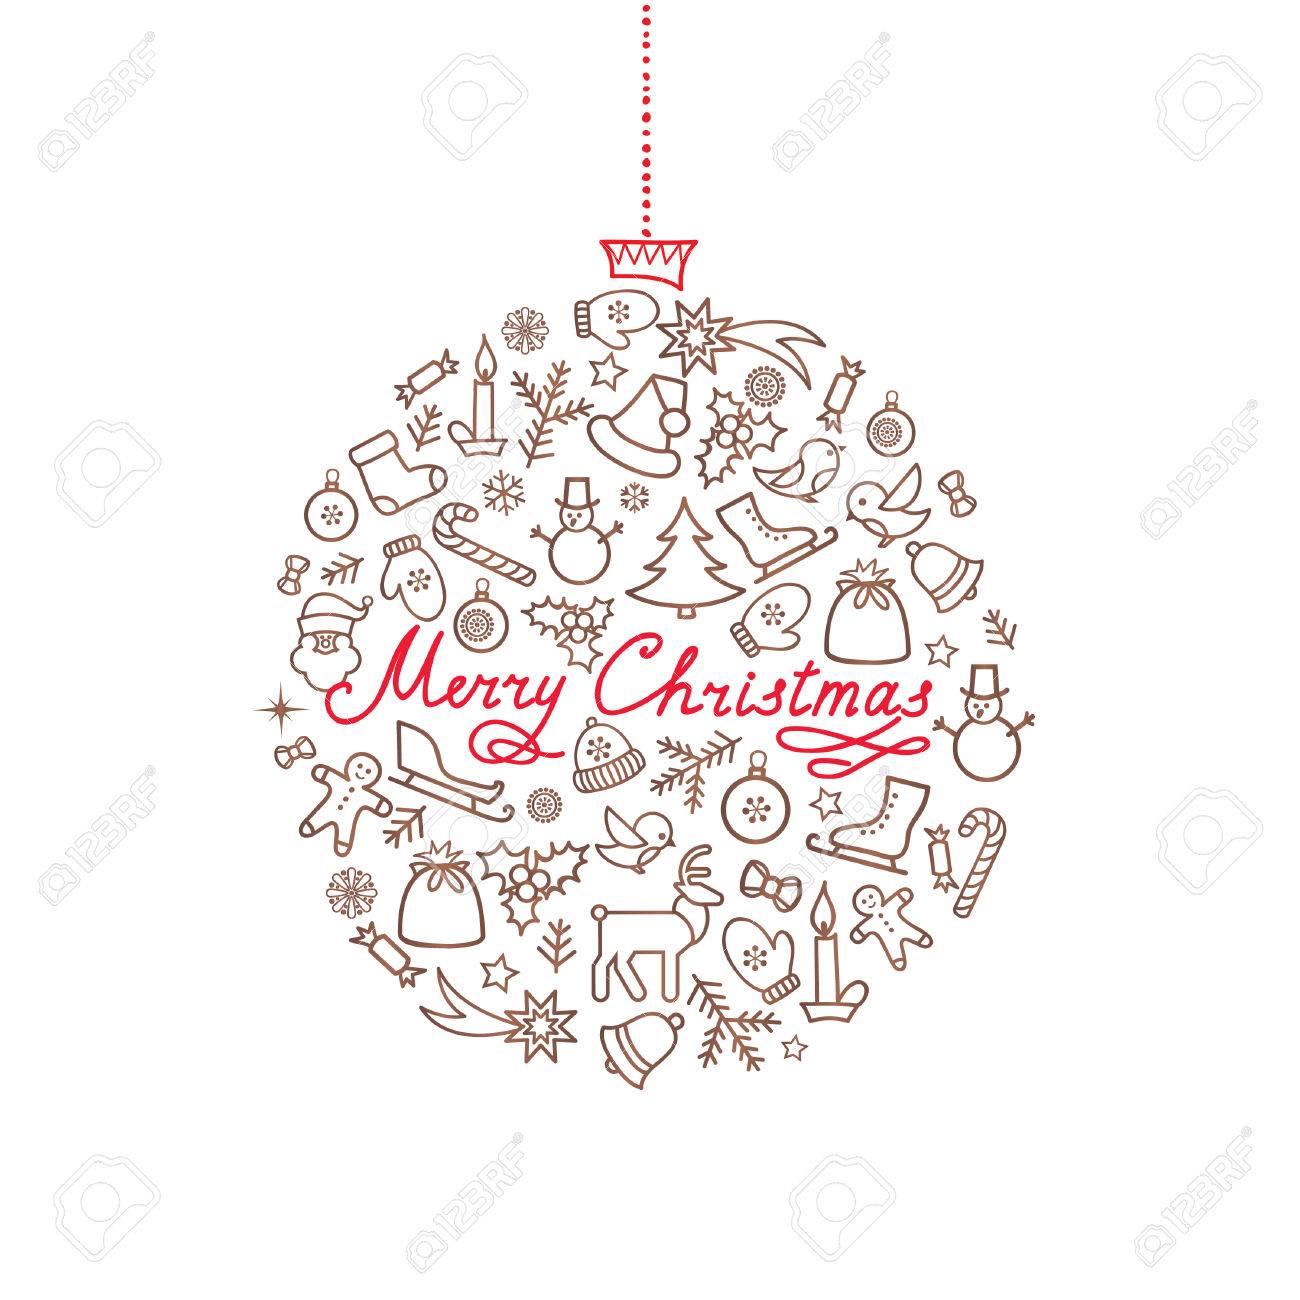 Doodle Weihnachtsfeier.Stock Photo